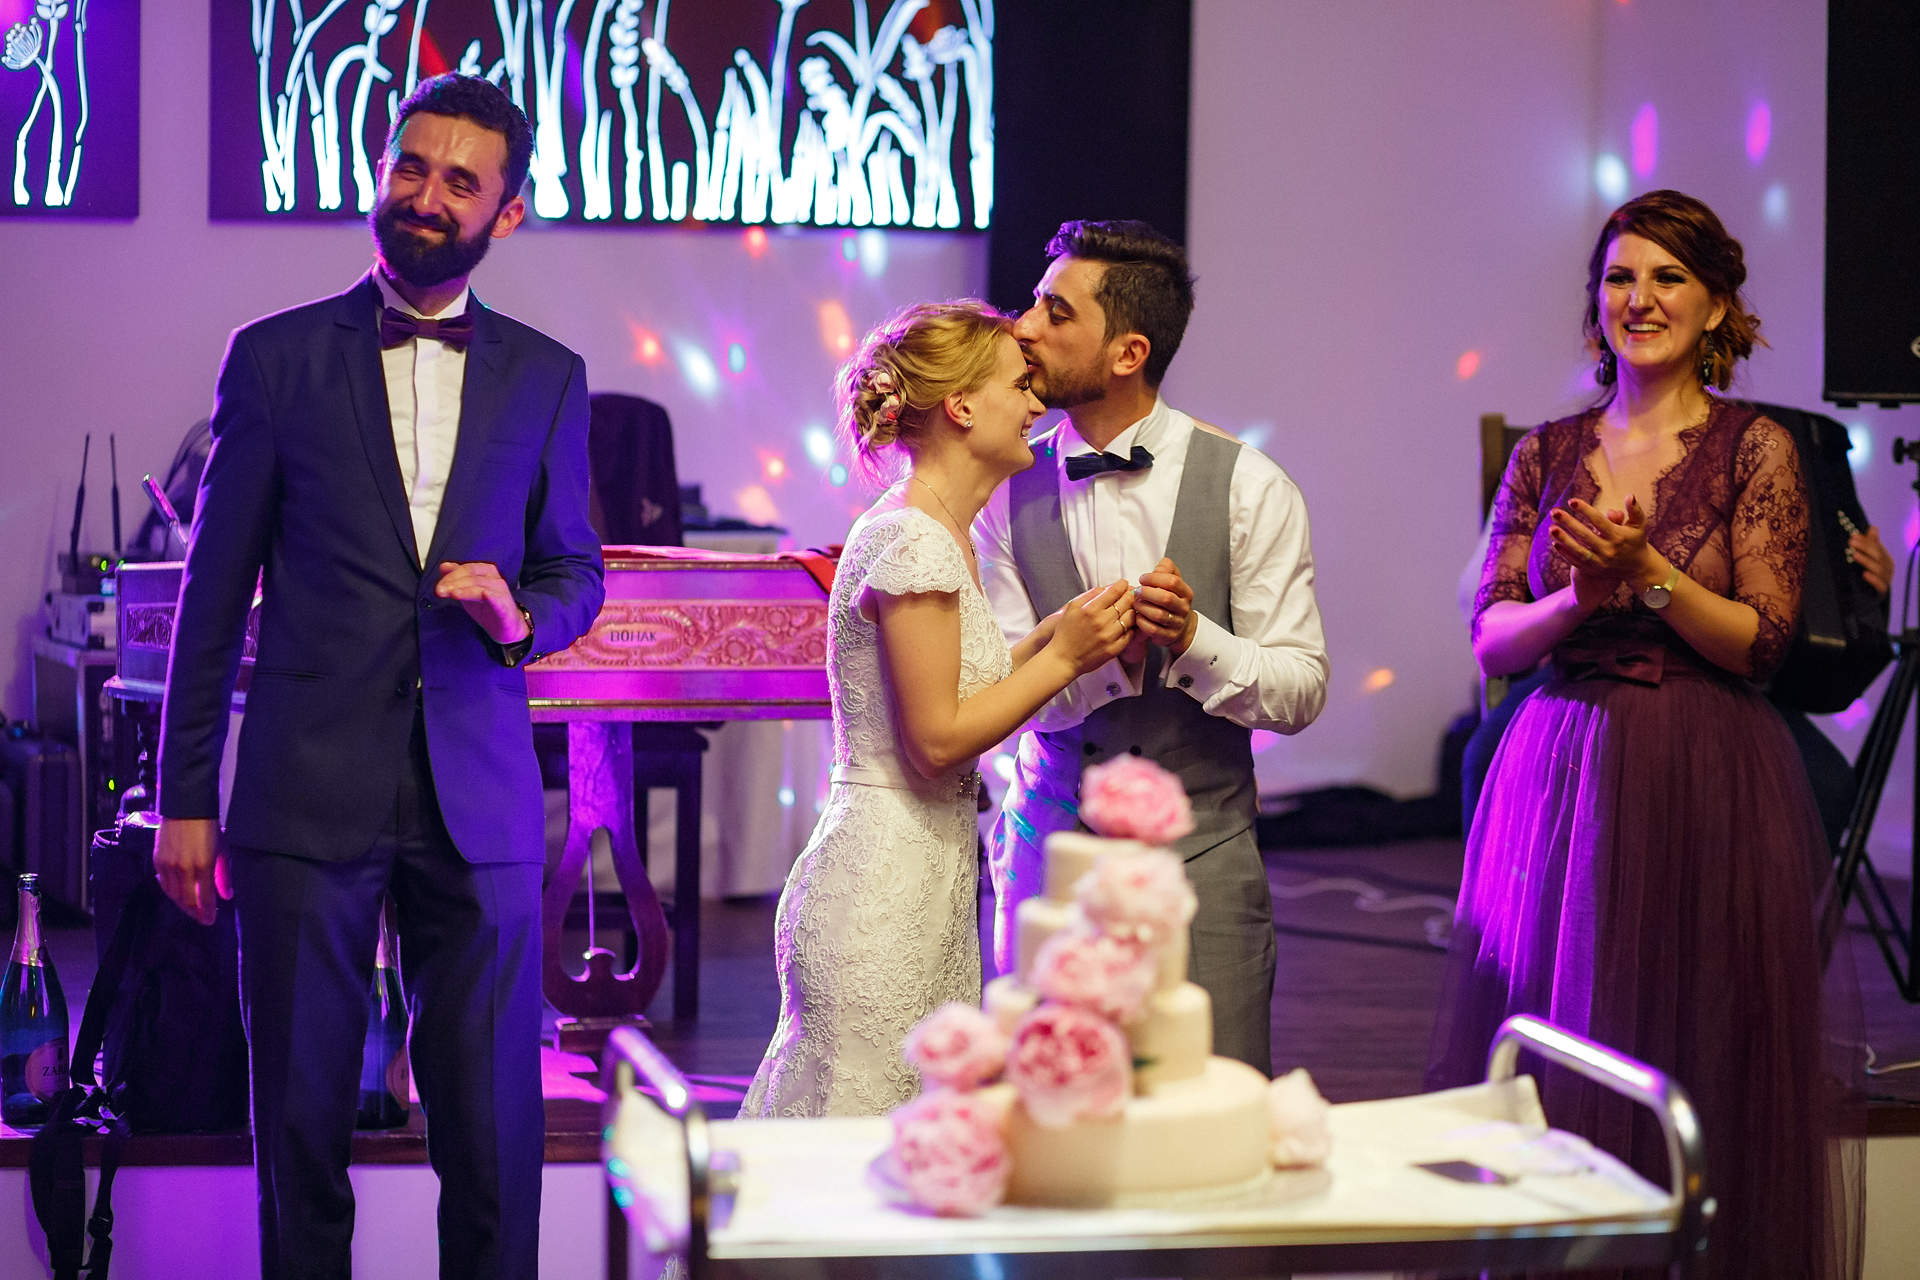 Fotograf-nunta-profesionist-Giurgiu-sesivede-fotografie-11